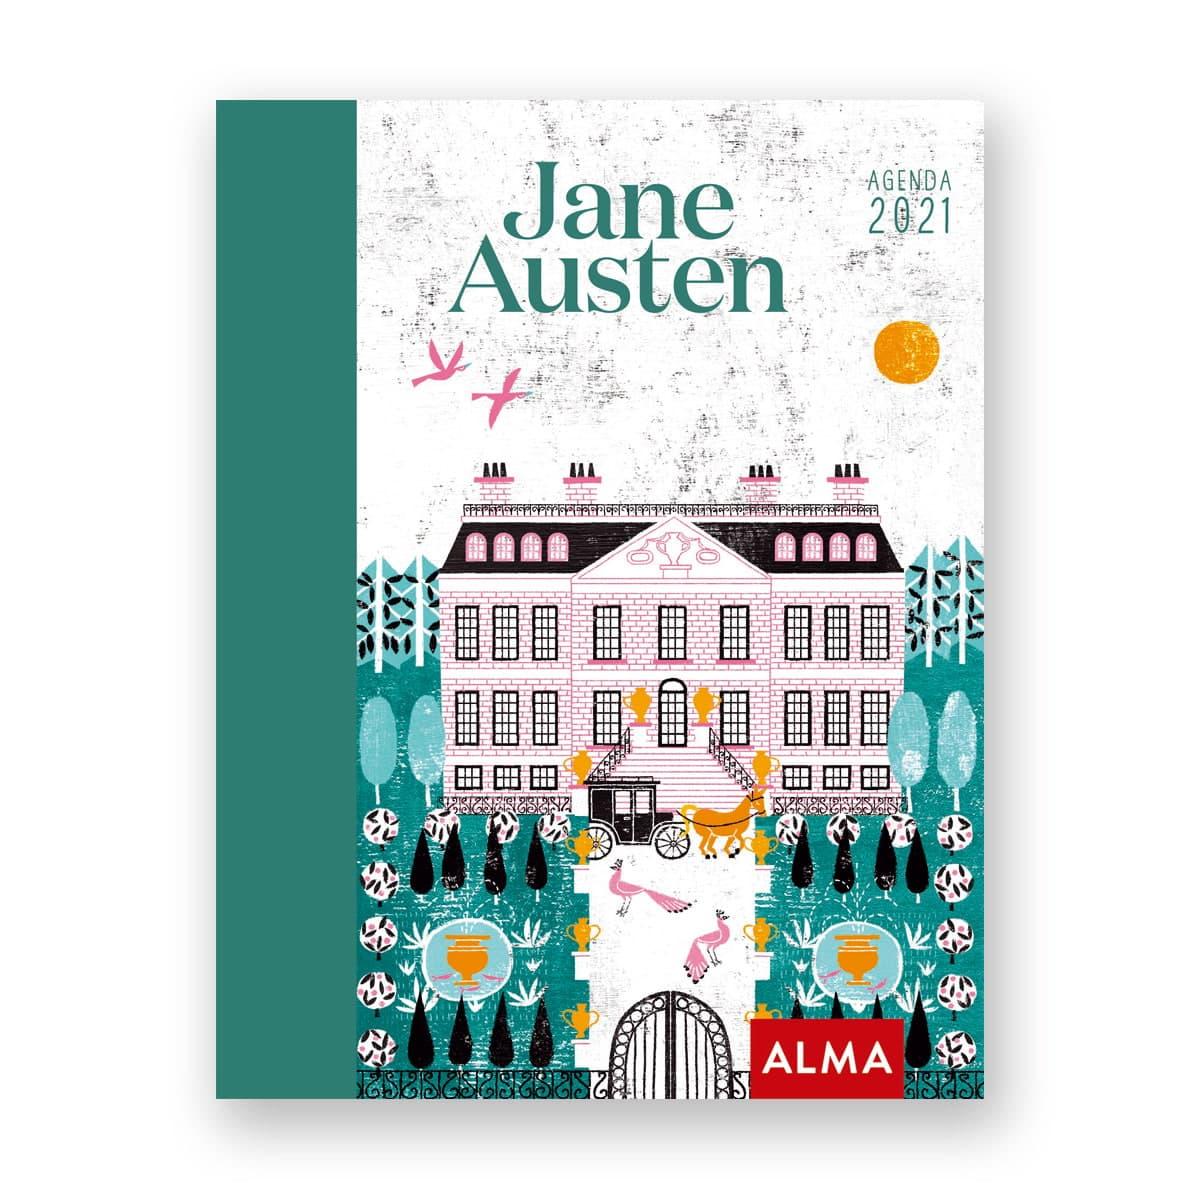 Agenda Jane Austen 2021